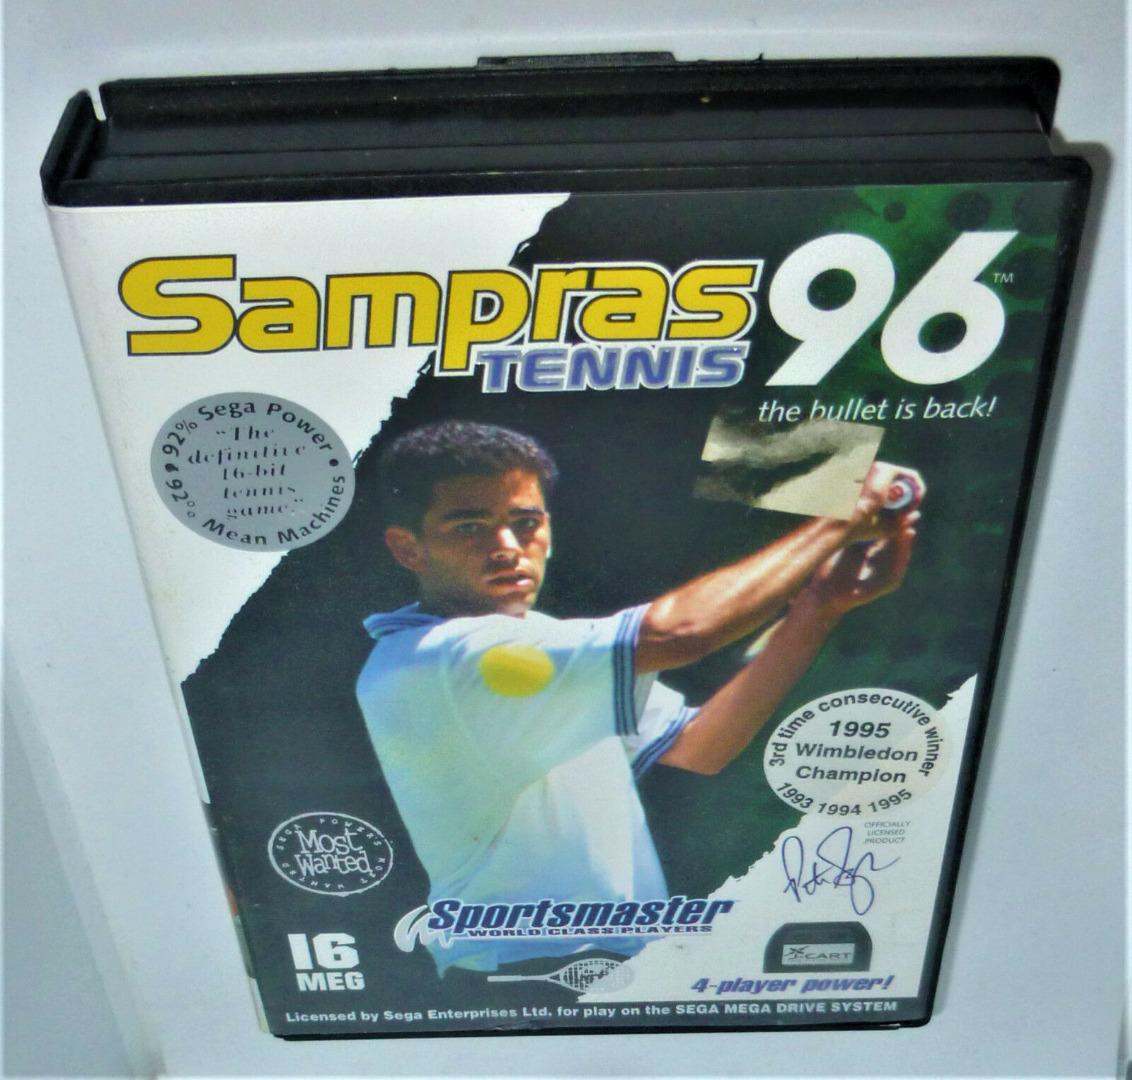 Sampras Tennis 96 - Codemasters - 2